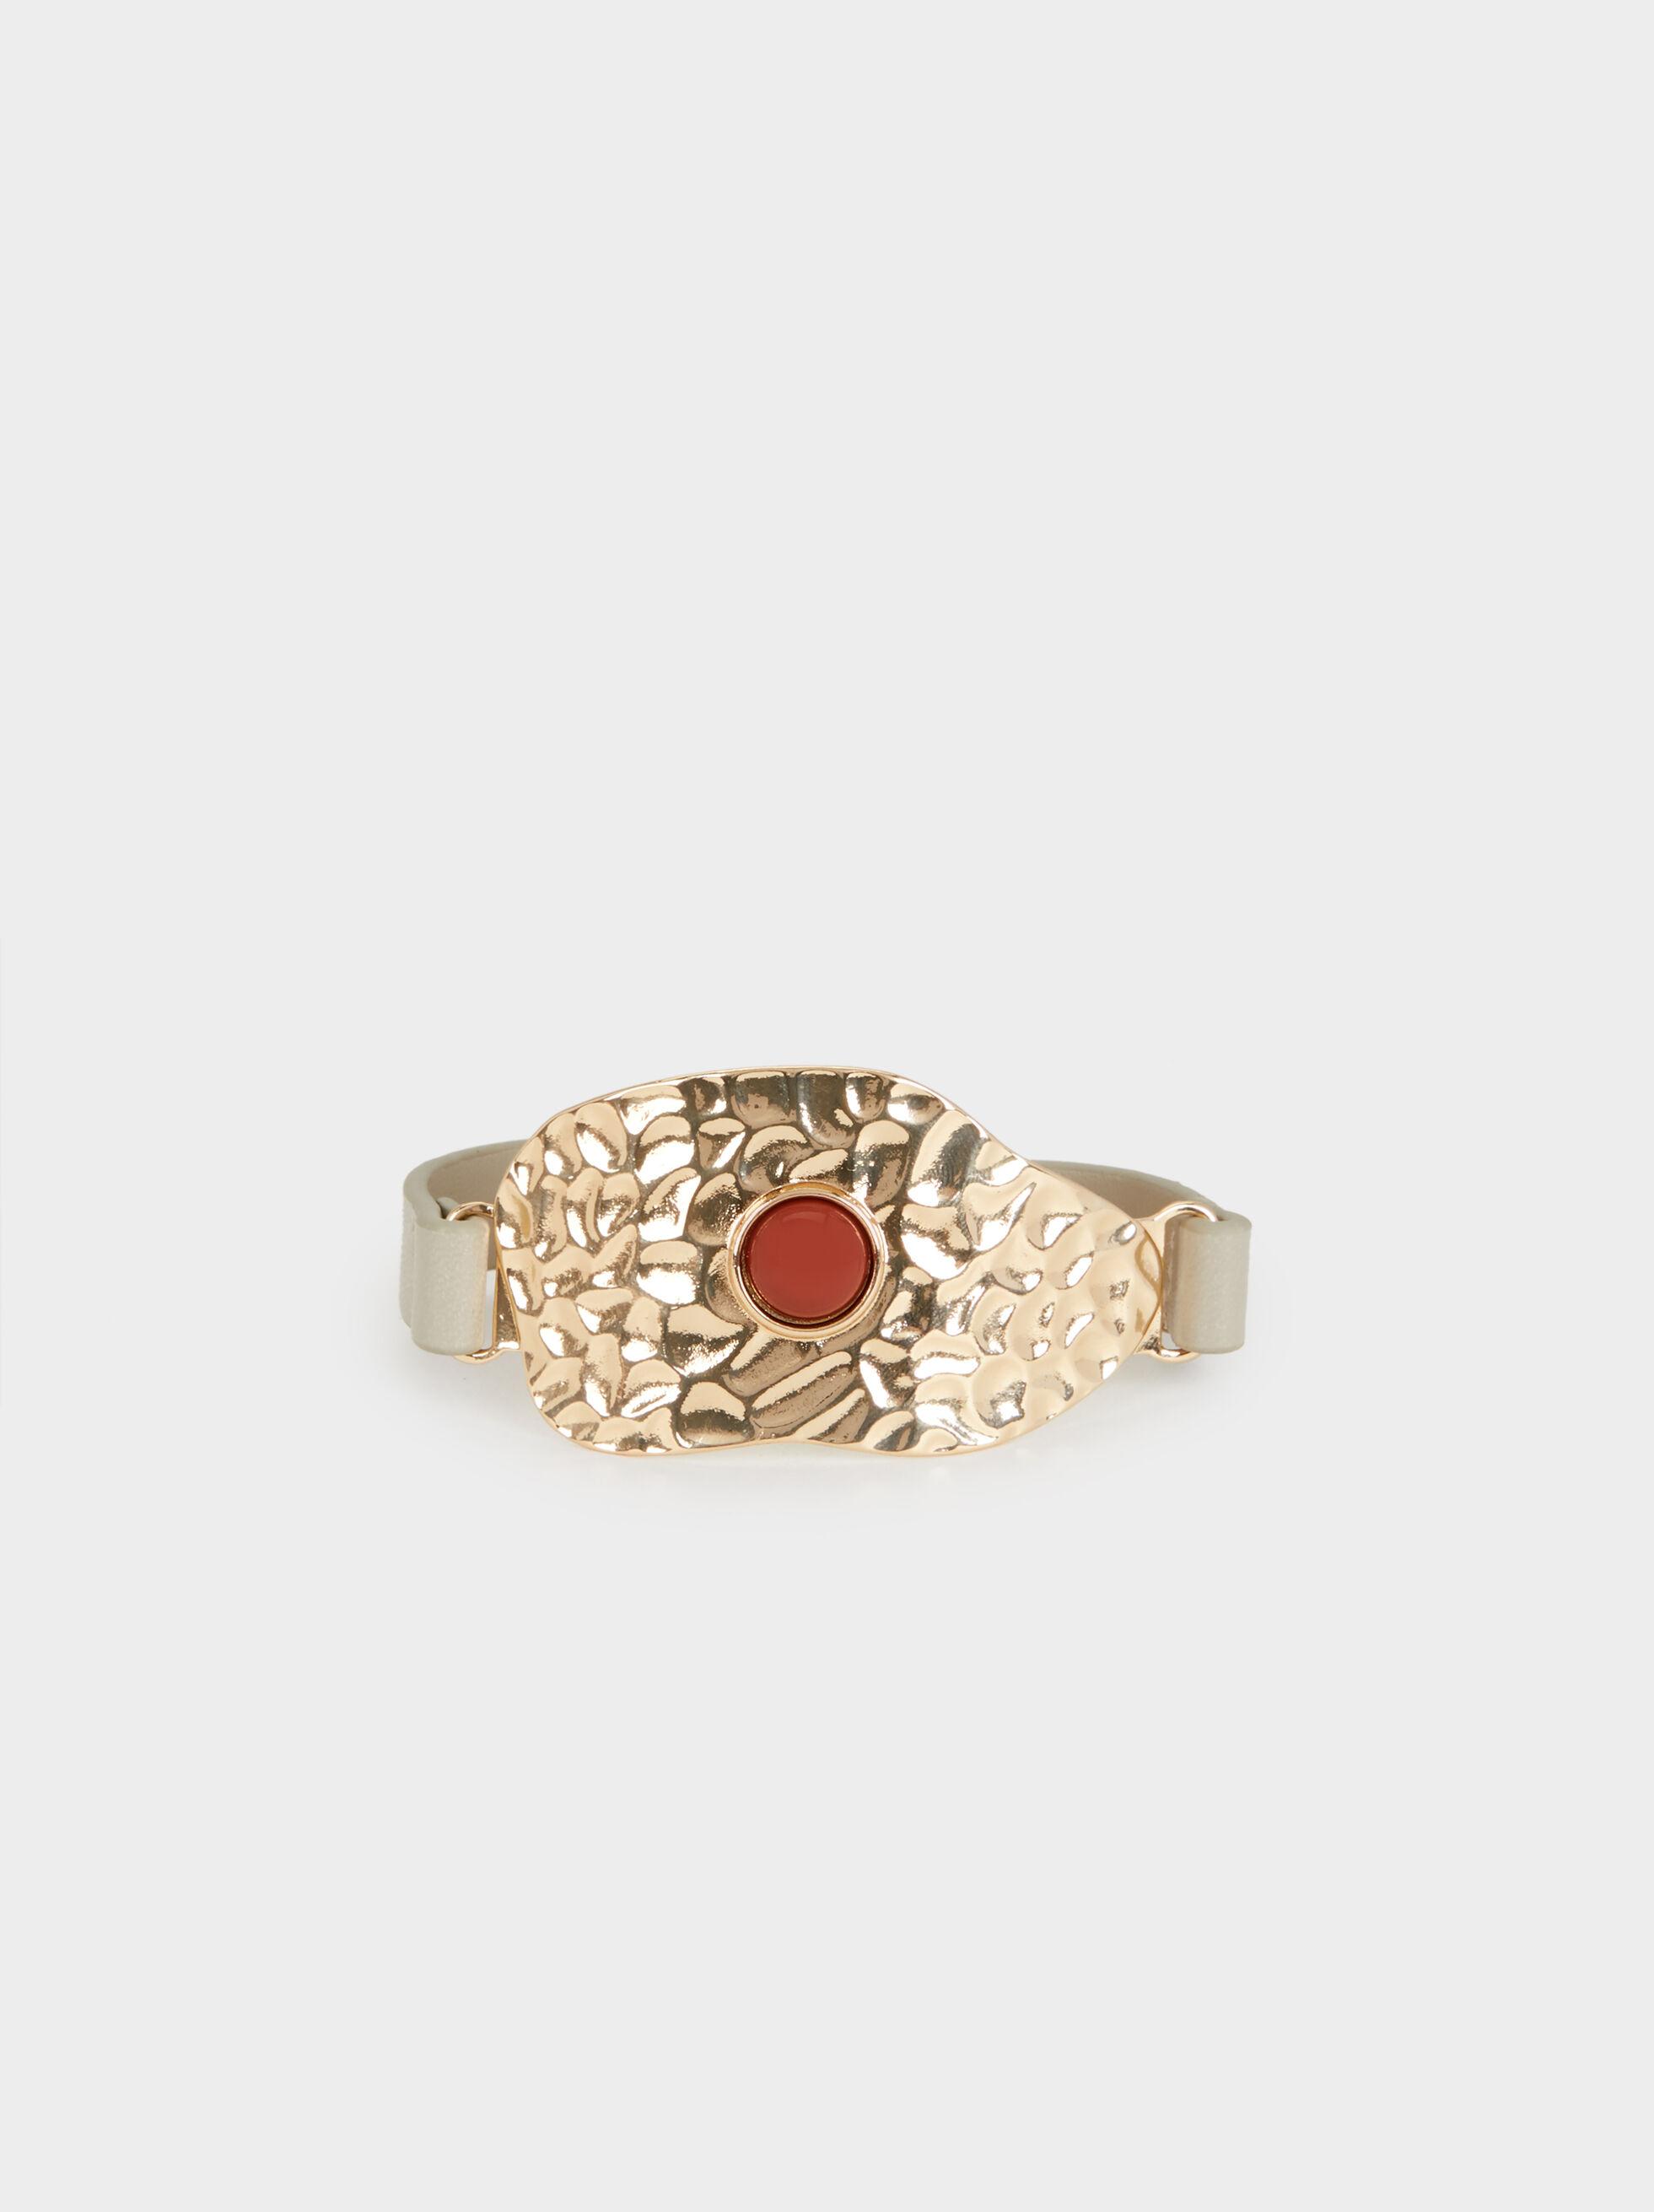 Land Adjustable Cuff Bracelet, Multicolor, hi-res